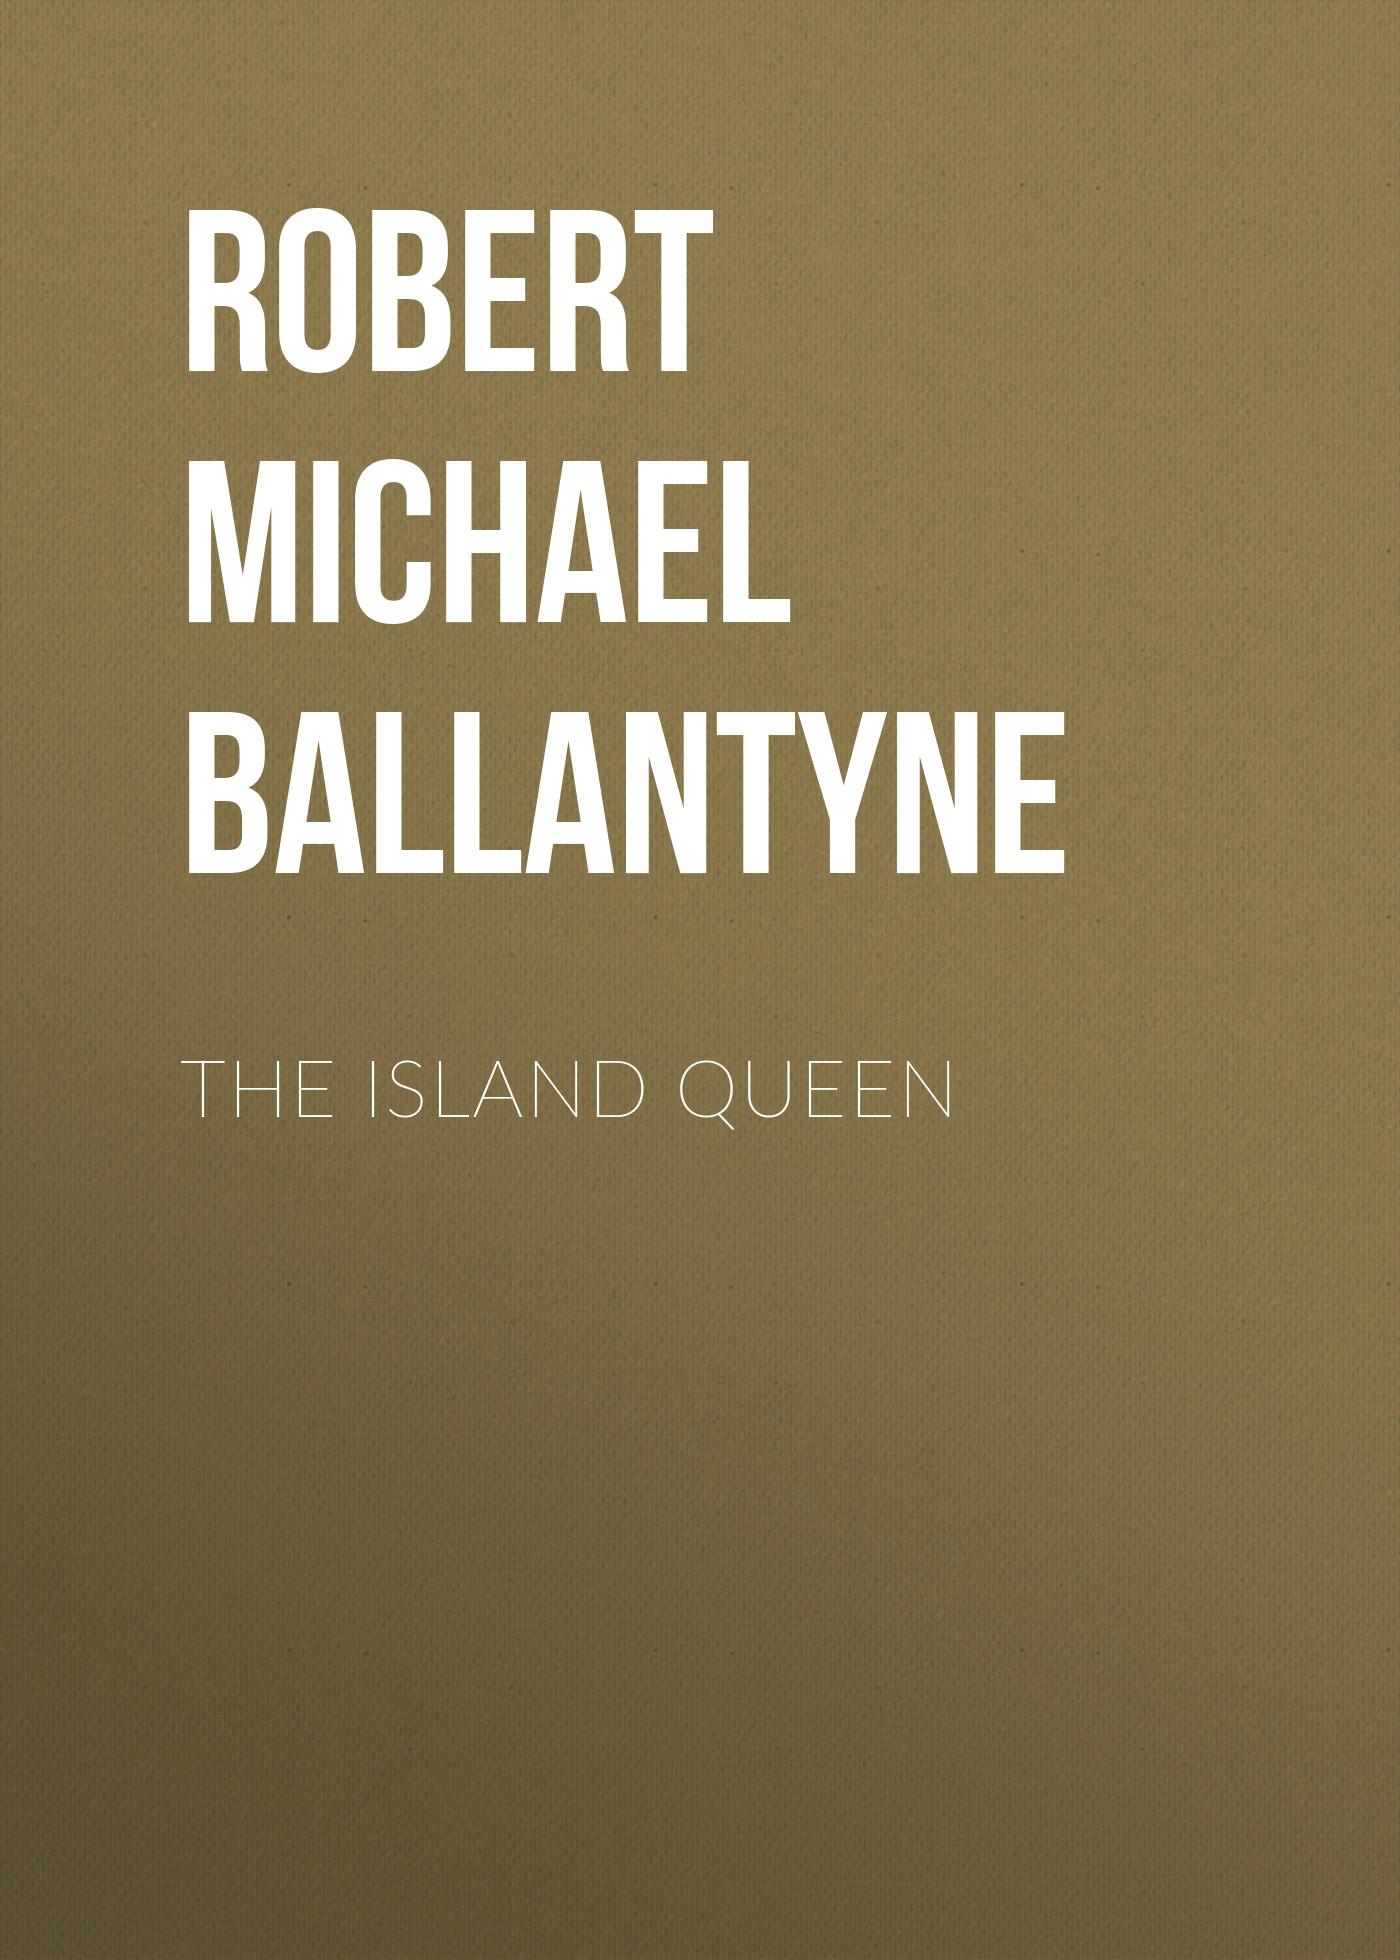 Robert Michael Ballantyne The Island Queen